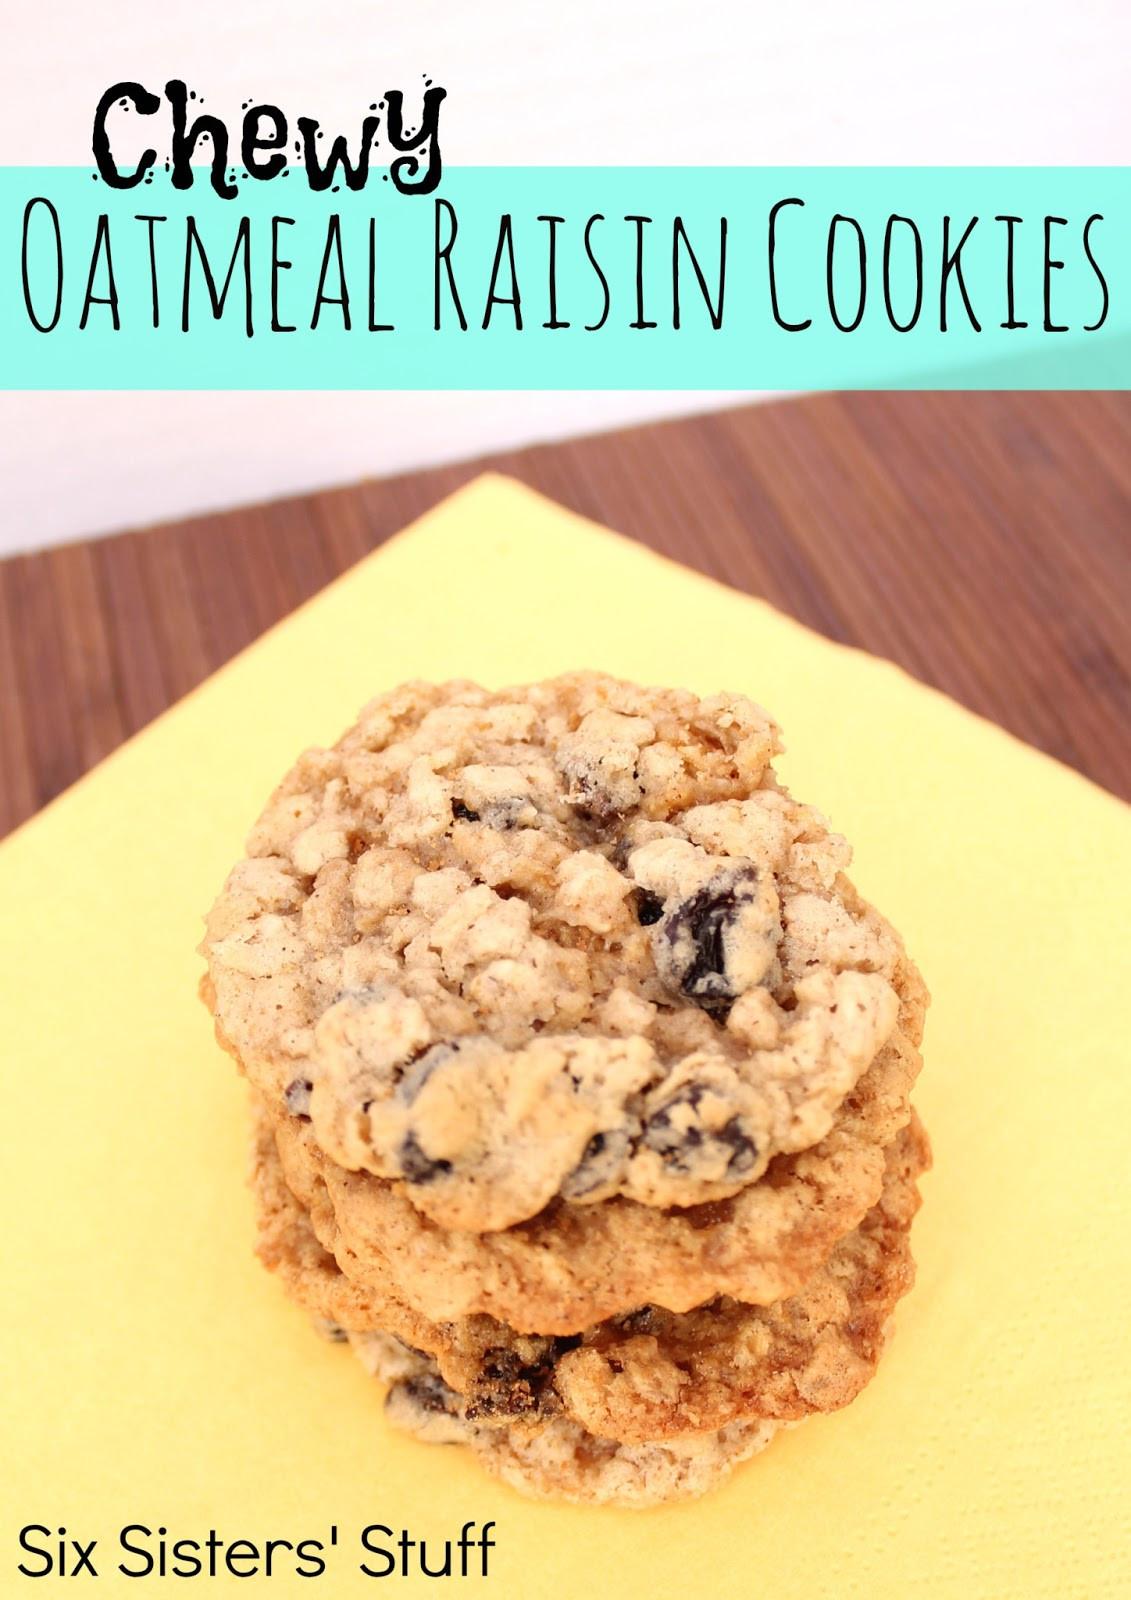 Best Chewy Oatmeal Cookies  Chewy Oatmeal Raisin Cookies Recipe